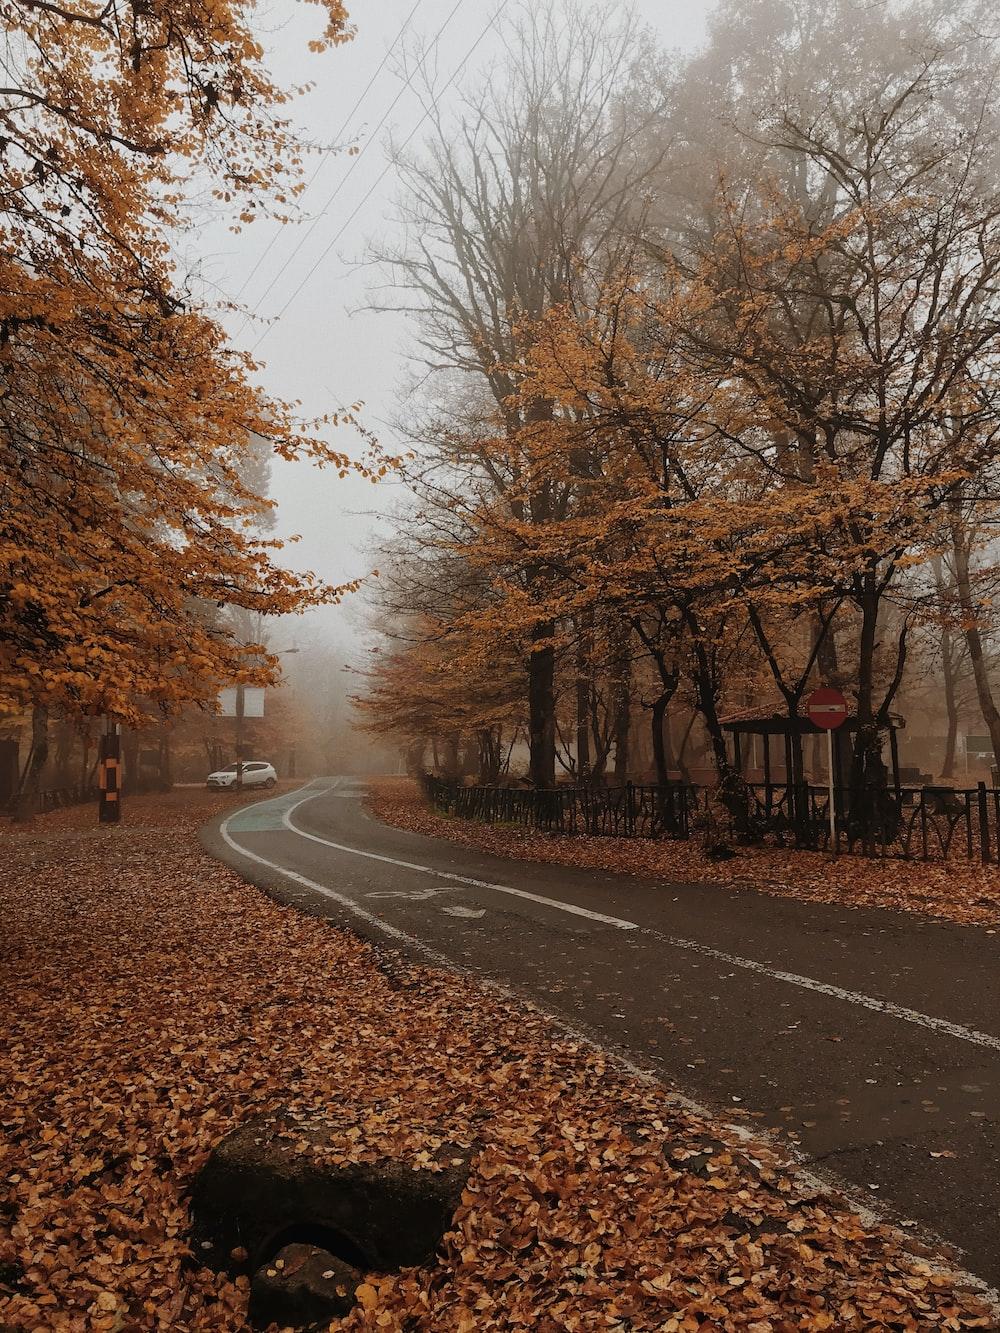 gray asphalt road between bare trees during daytime